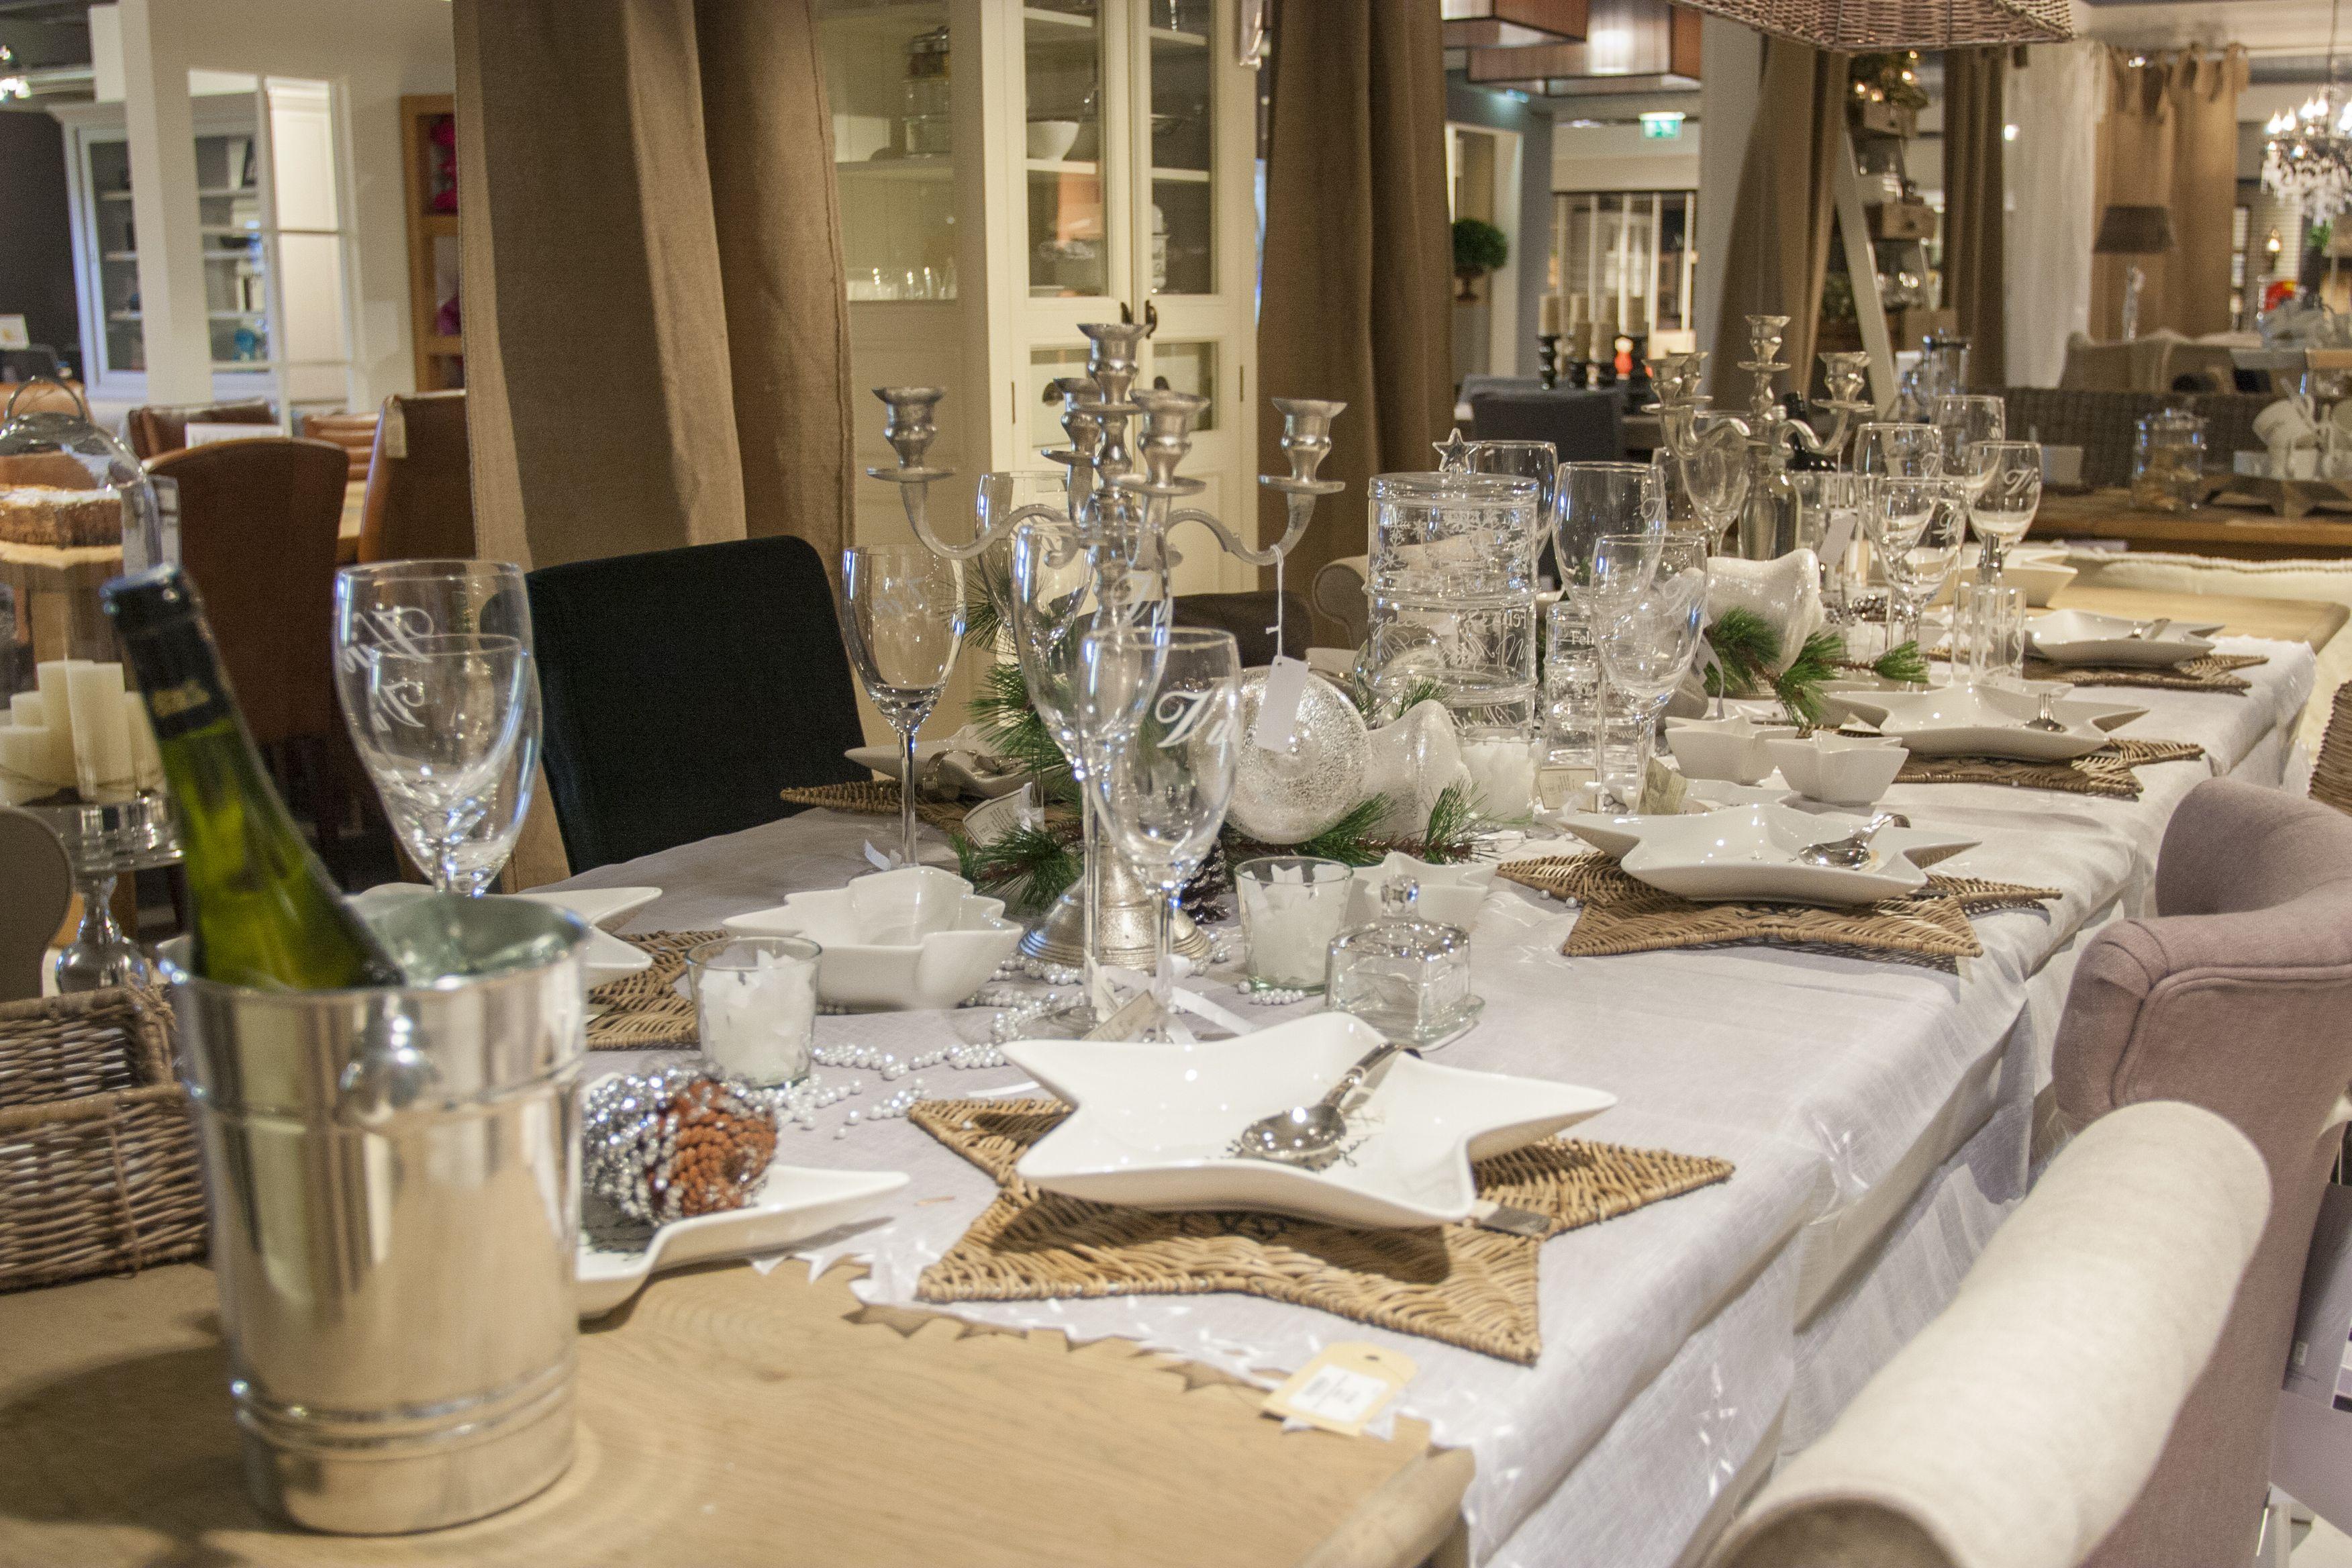 Feestdagen Kersttafel Aankleden : Mooi gedekte tafel in kerstsfeer op onze rivièra maison afdeling